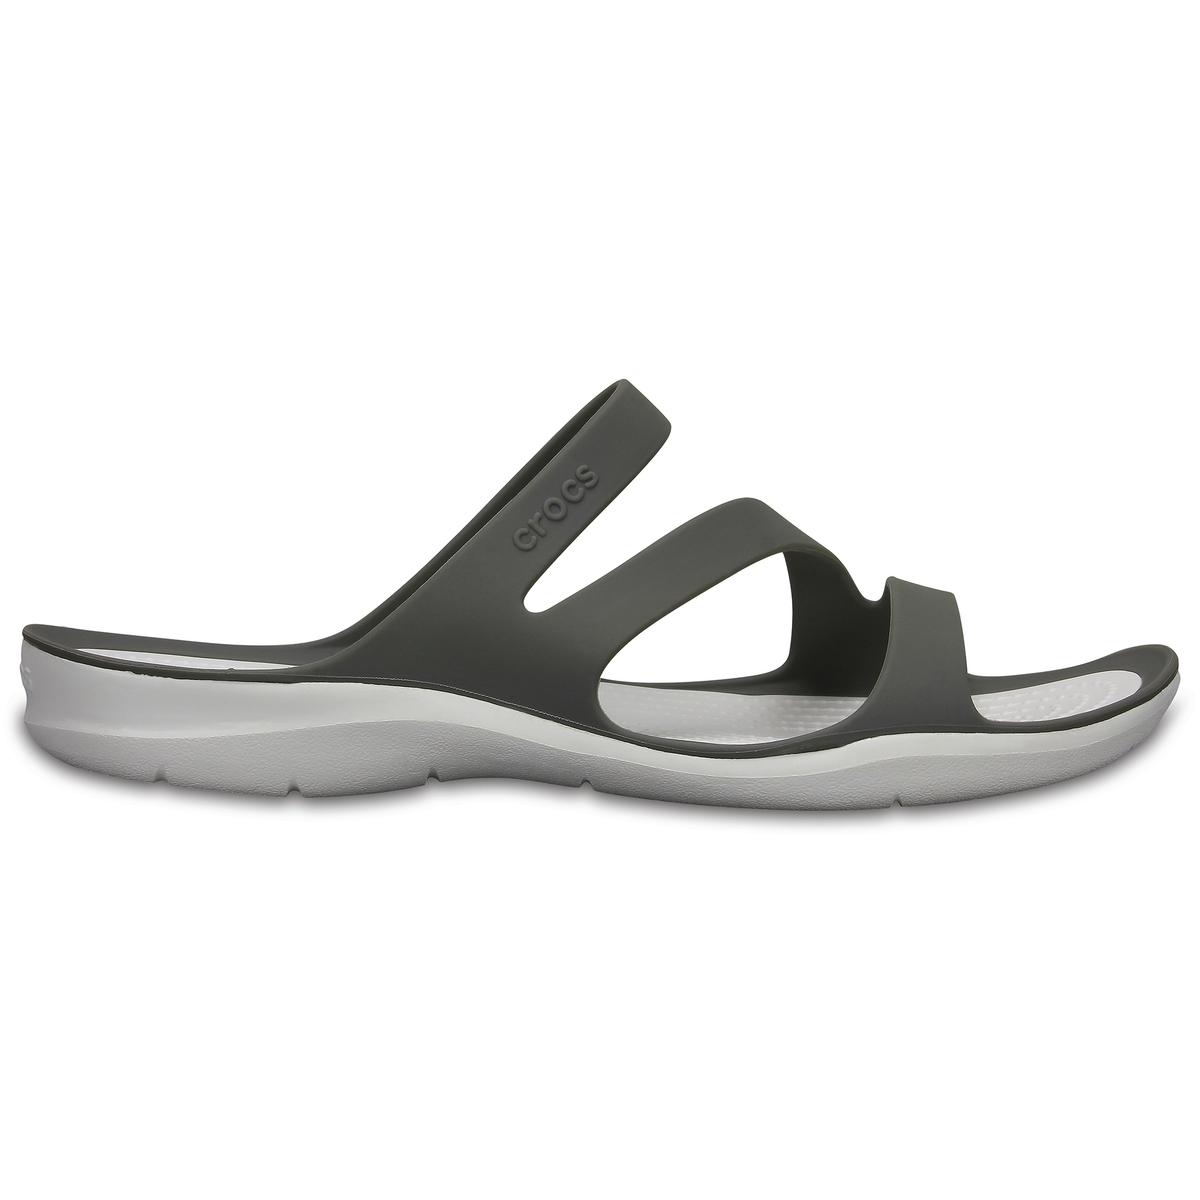 Туфли без задника Swiftwater Sandal WВерх : термопластик   Подкладка : без подкладки   Стелька : термопластик   Подошва : полимер Croslite   Застежка : без застежки<br><br>Цвет: серый<br>Размер: 36/37